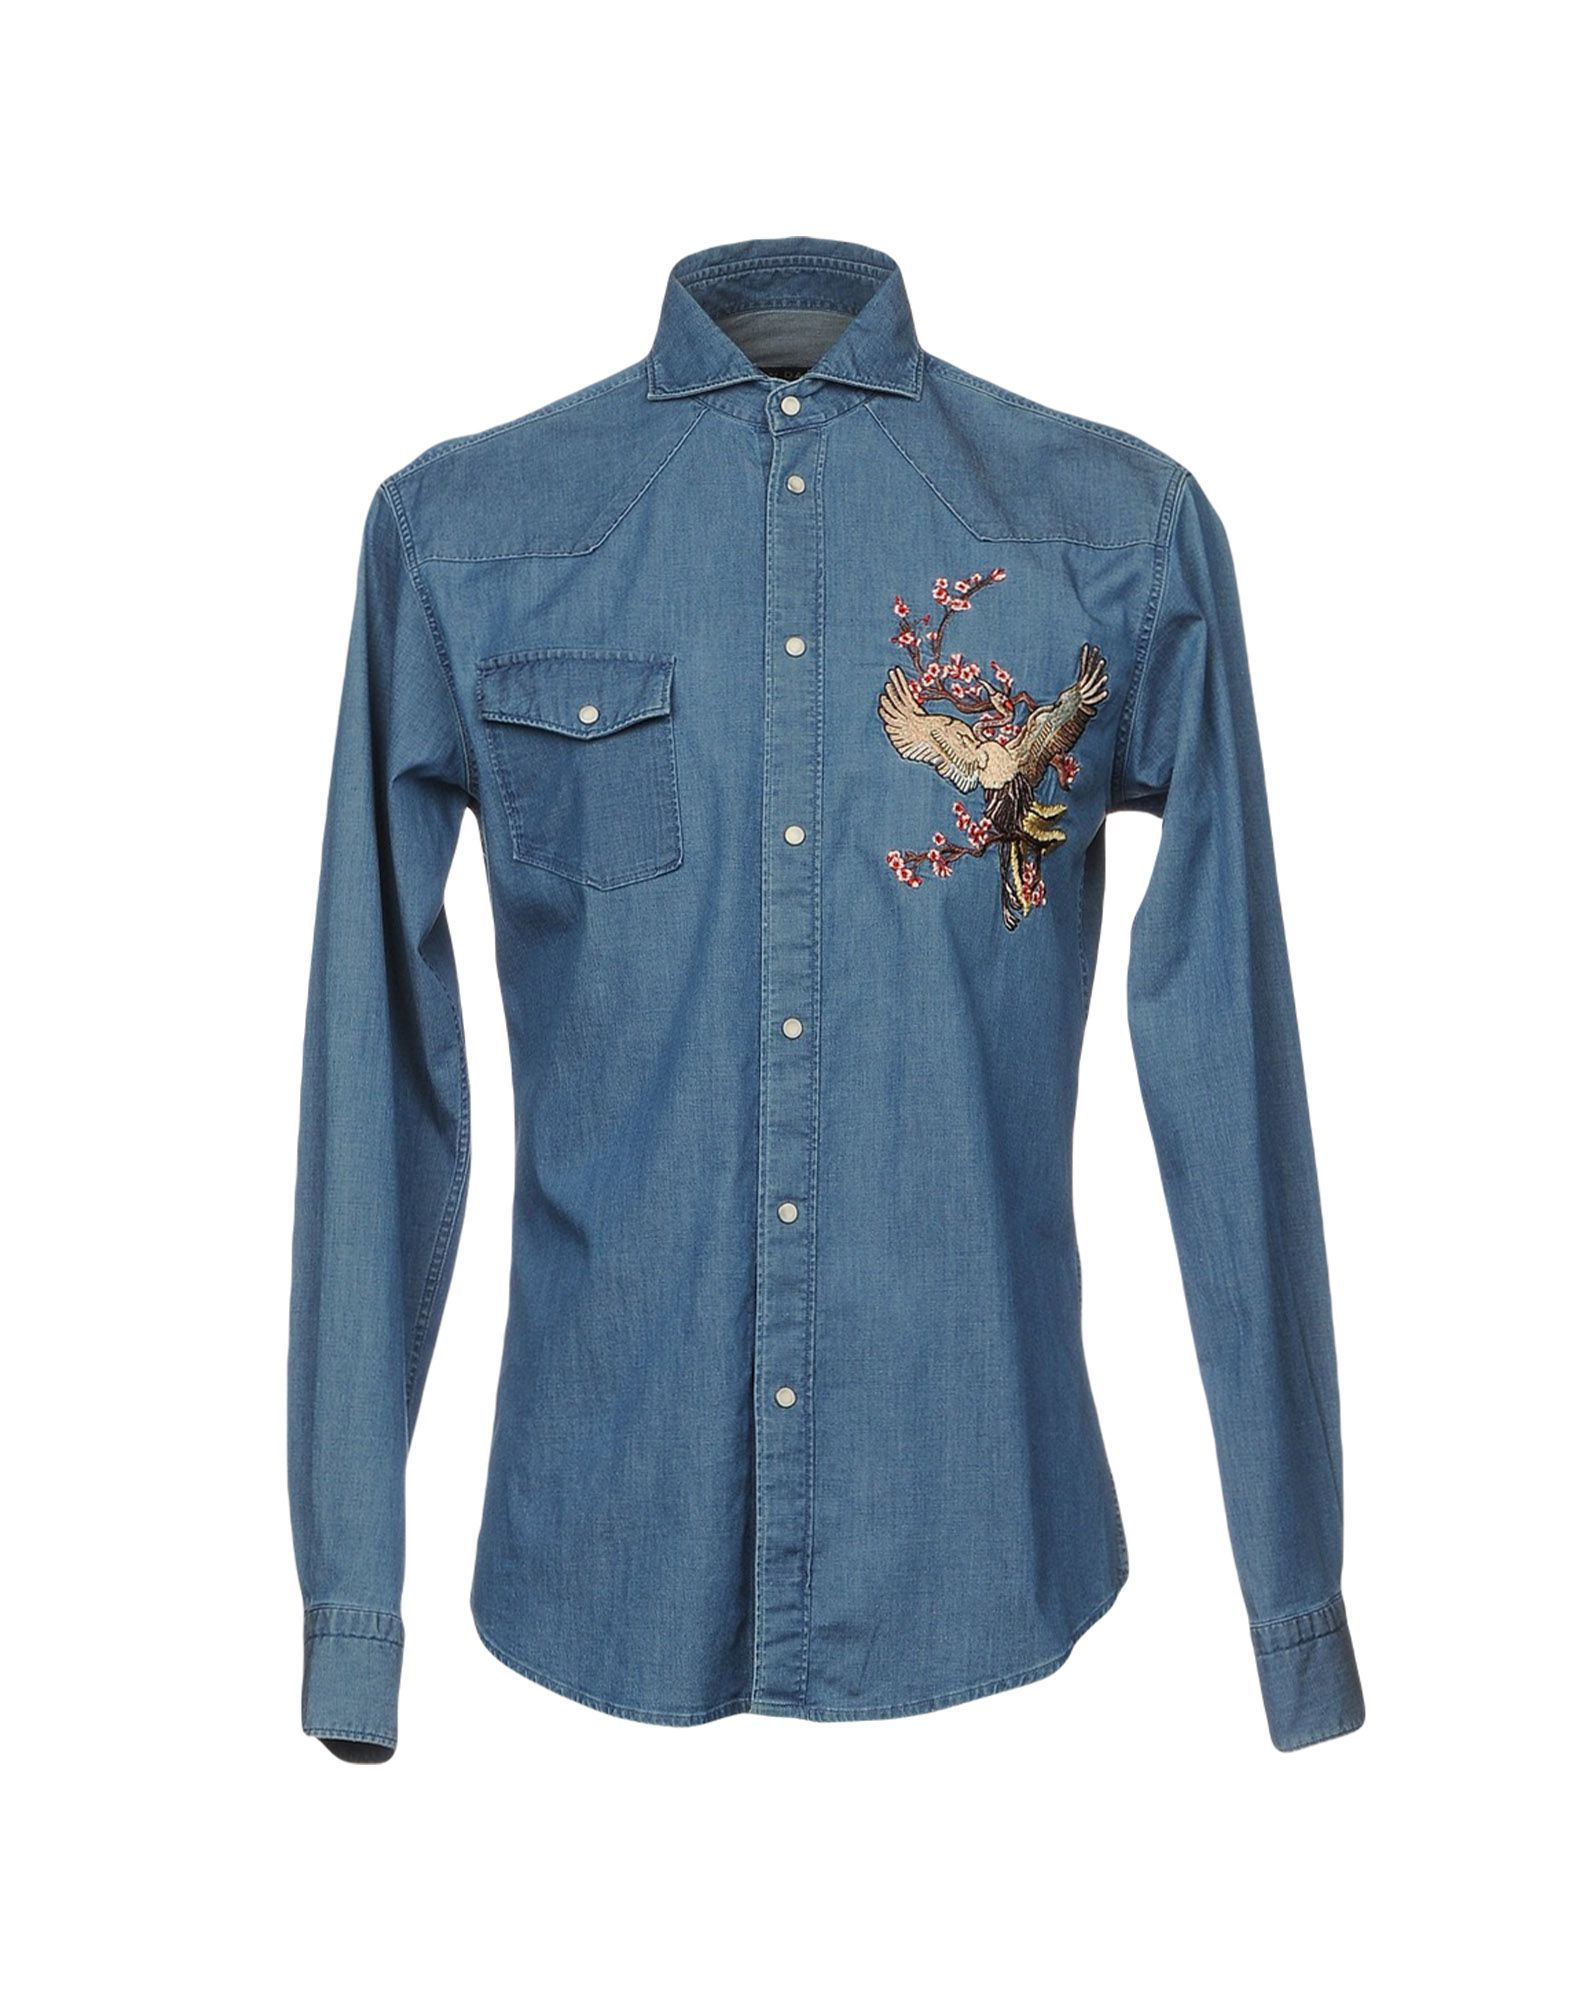 BRIAN DALES Джинсовая рубашка